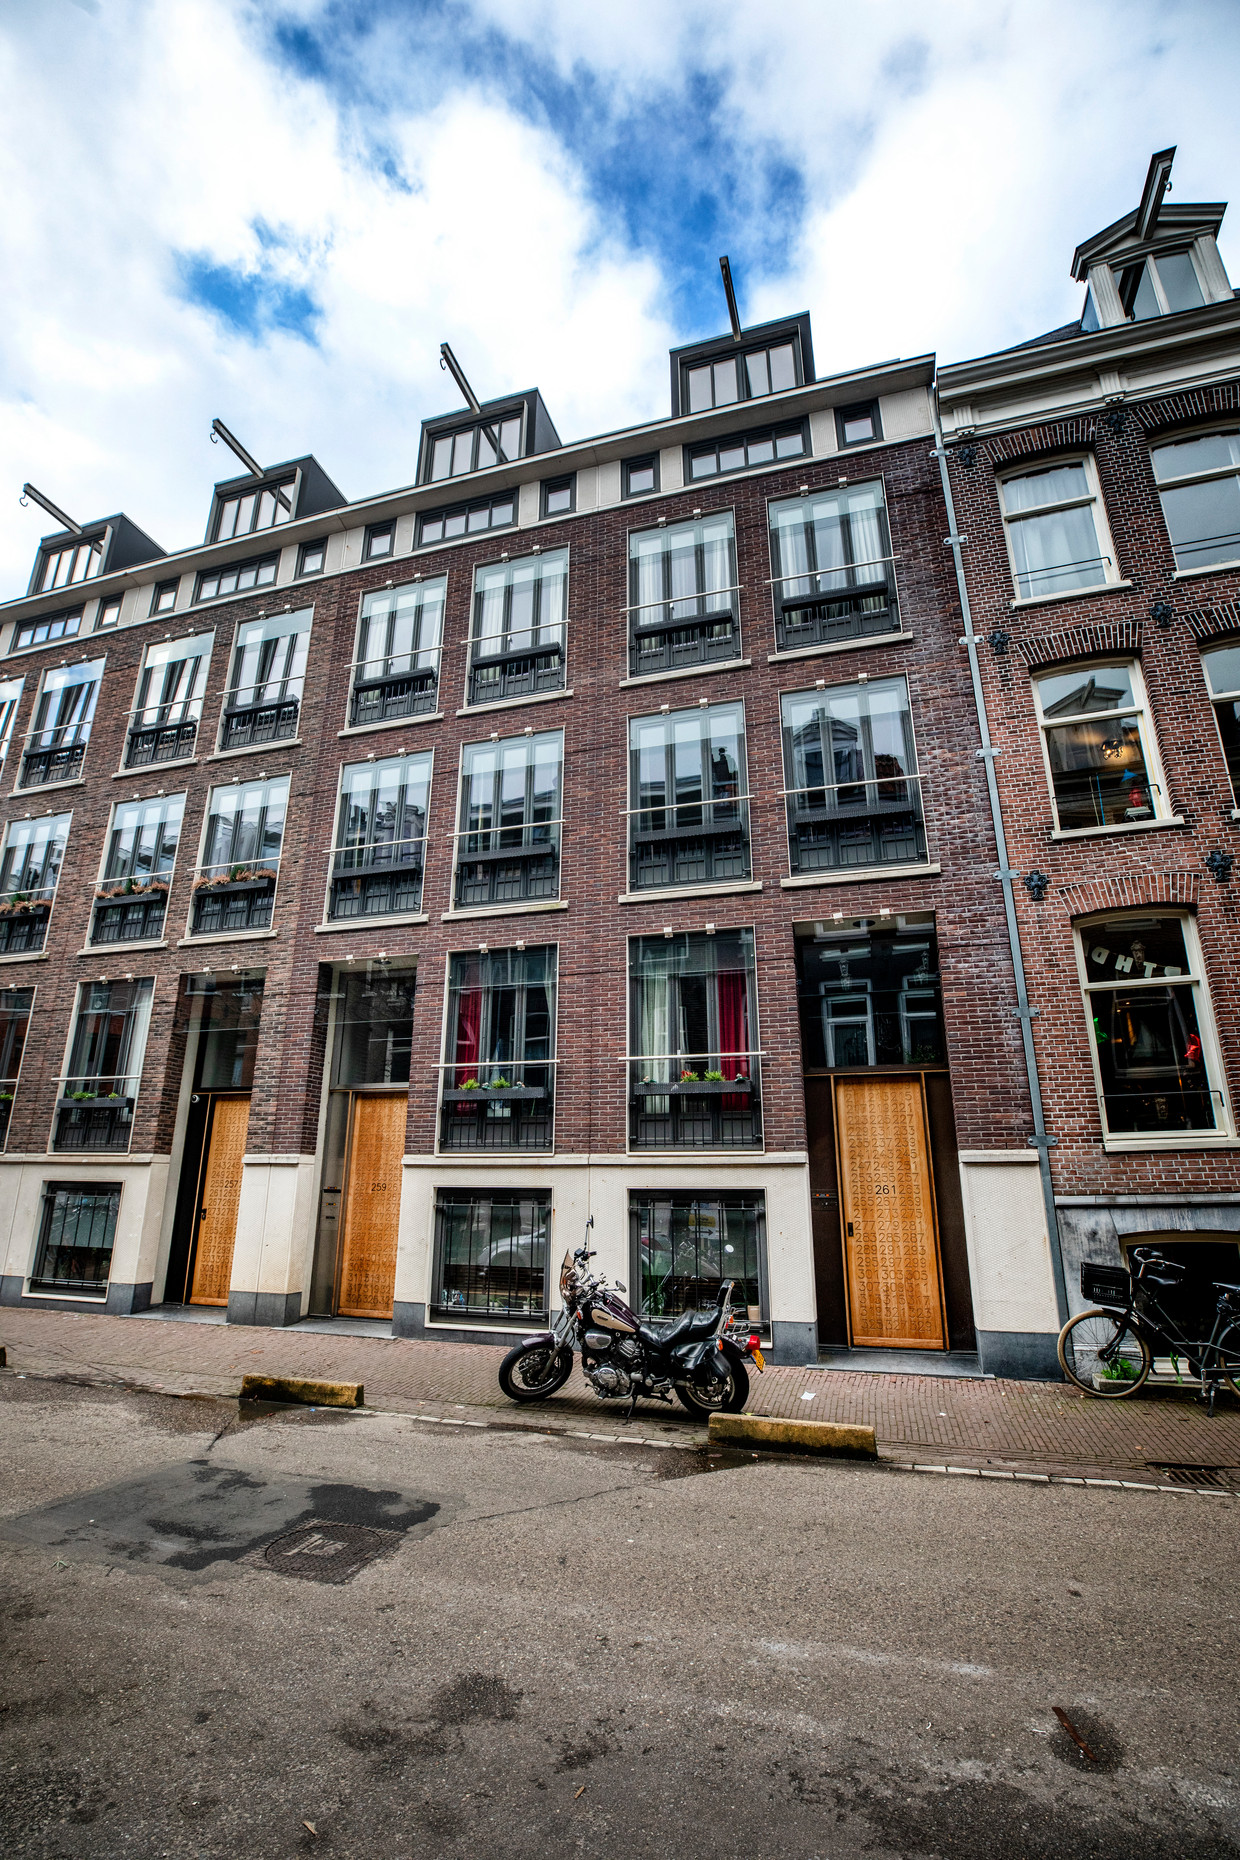 Govert Flinckstraat 259A, Amsterdam. Vraagprijs 500.000 euro. Verkoopprijs 660.000 euro. Beeld Raymond Rutting / de Volkskrant